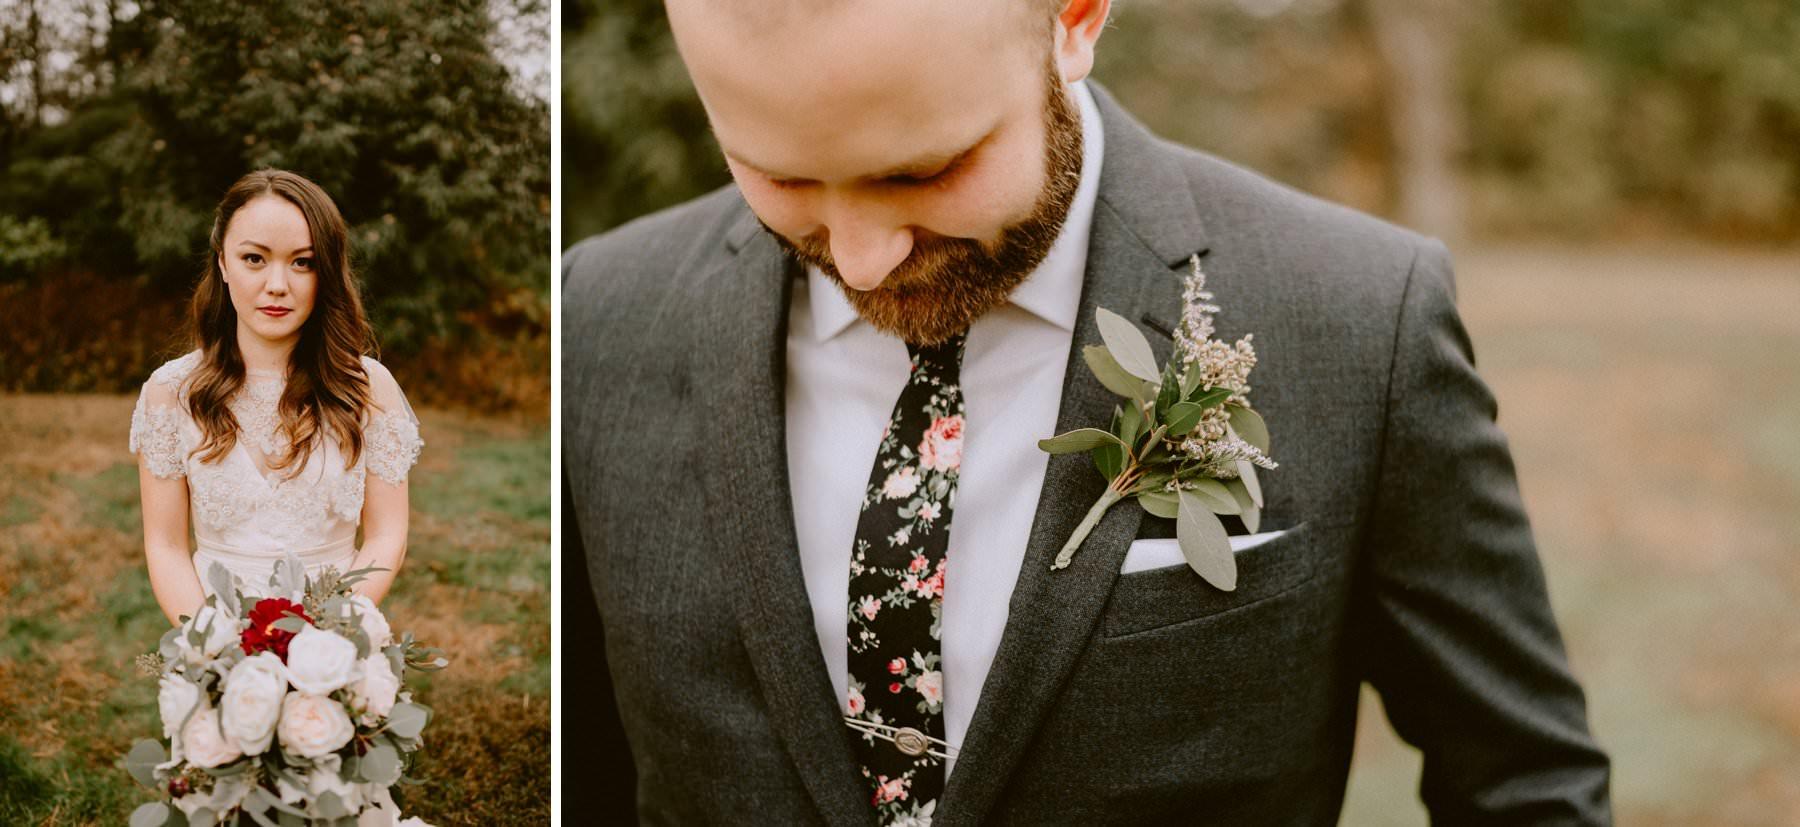 Tyler_arboretum_wedding-032.jpg